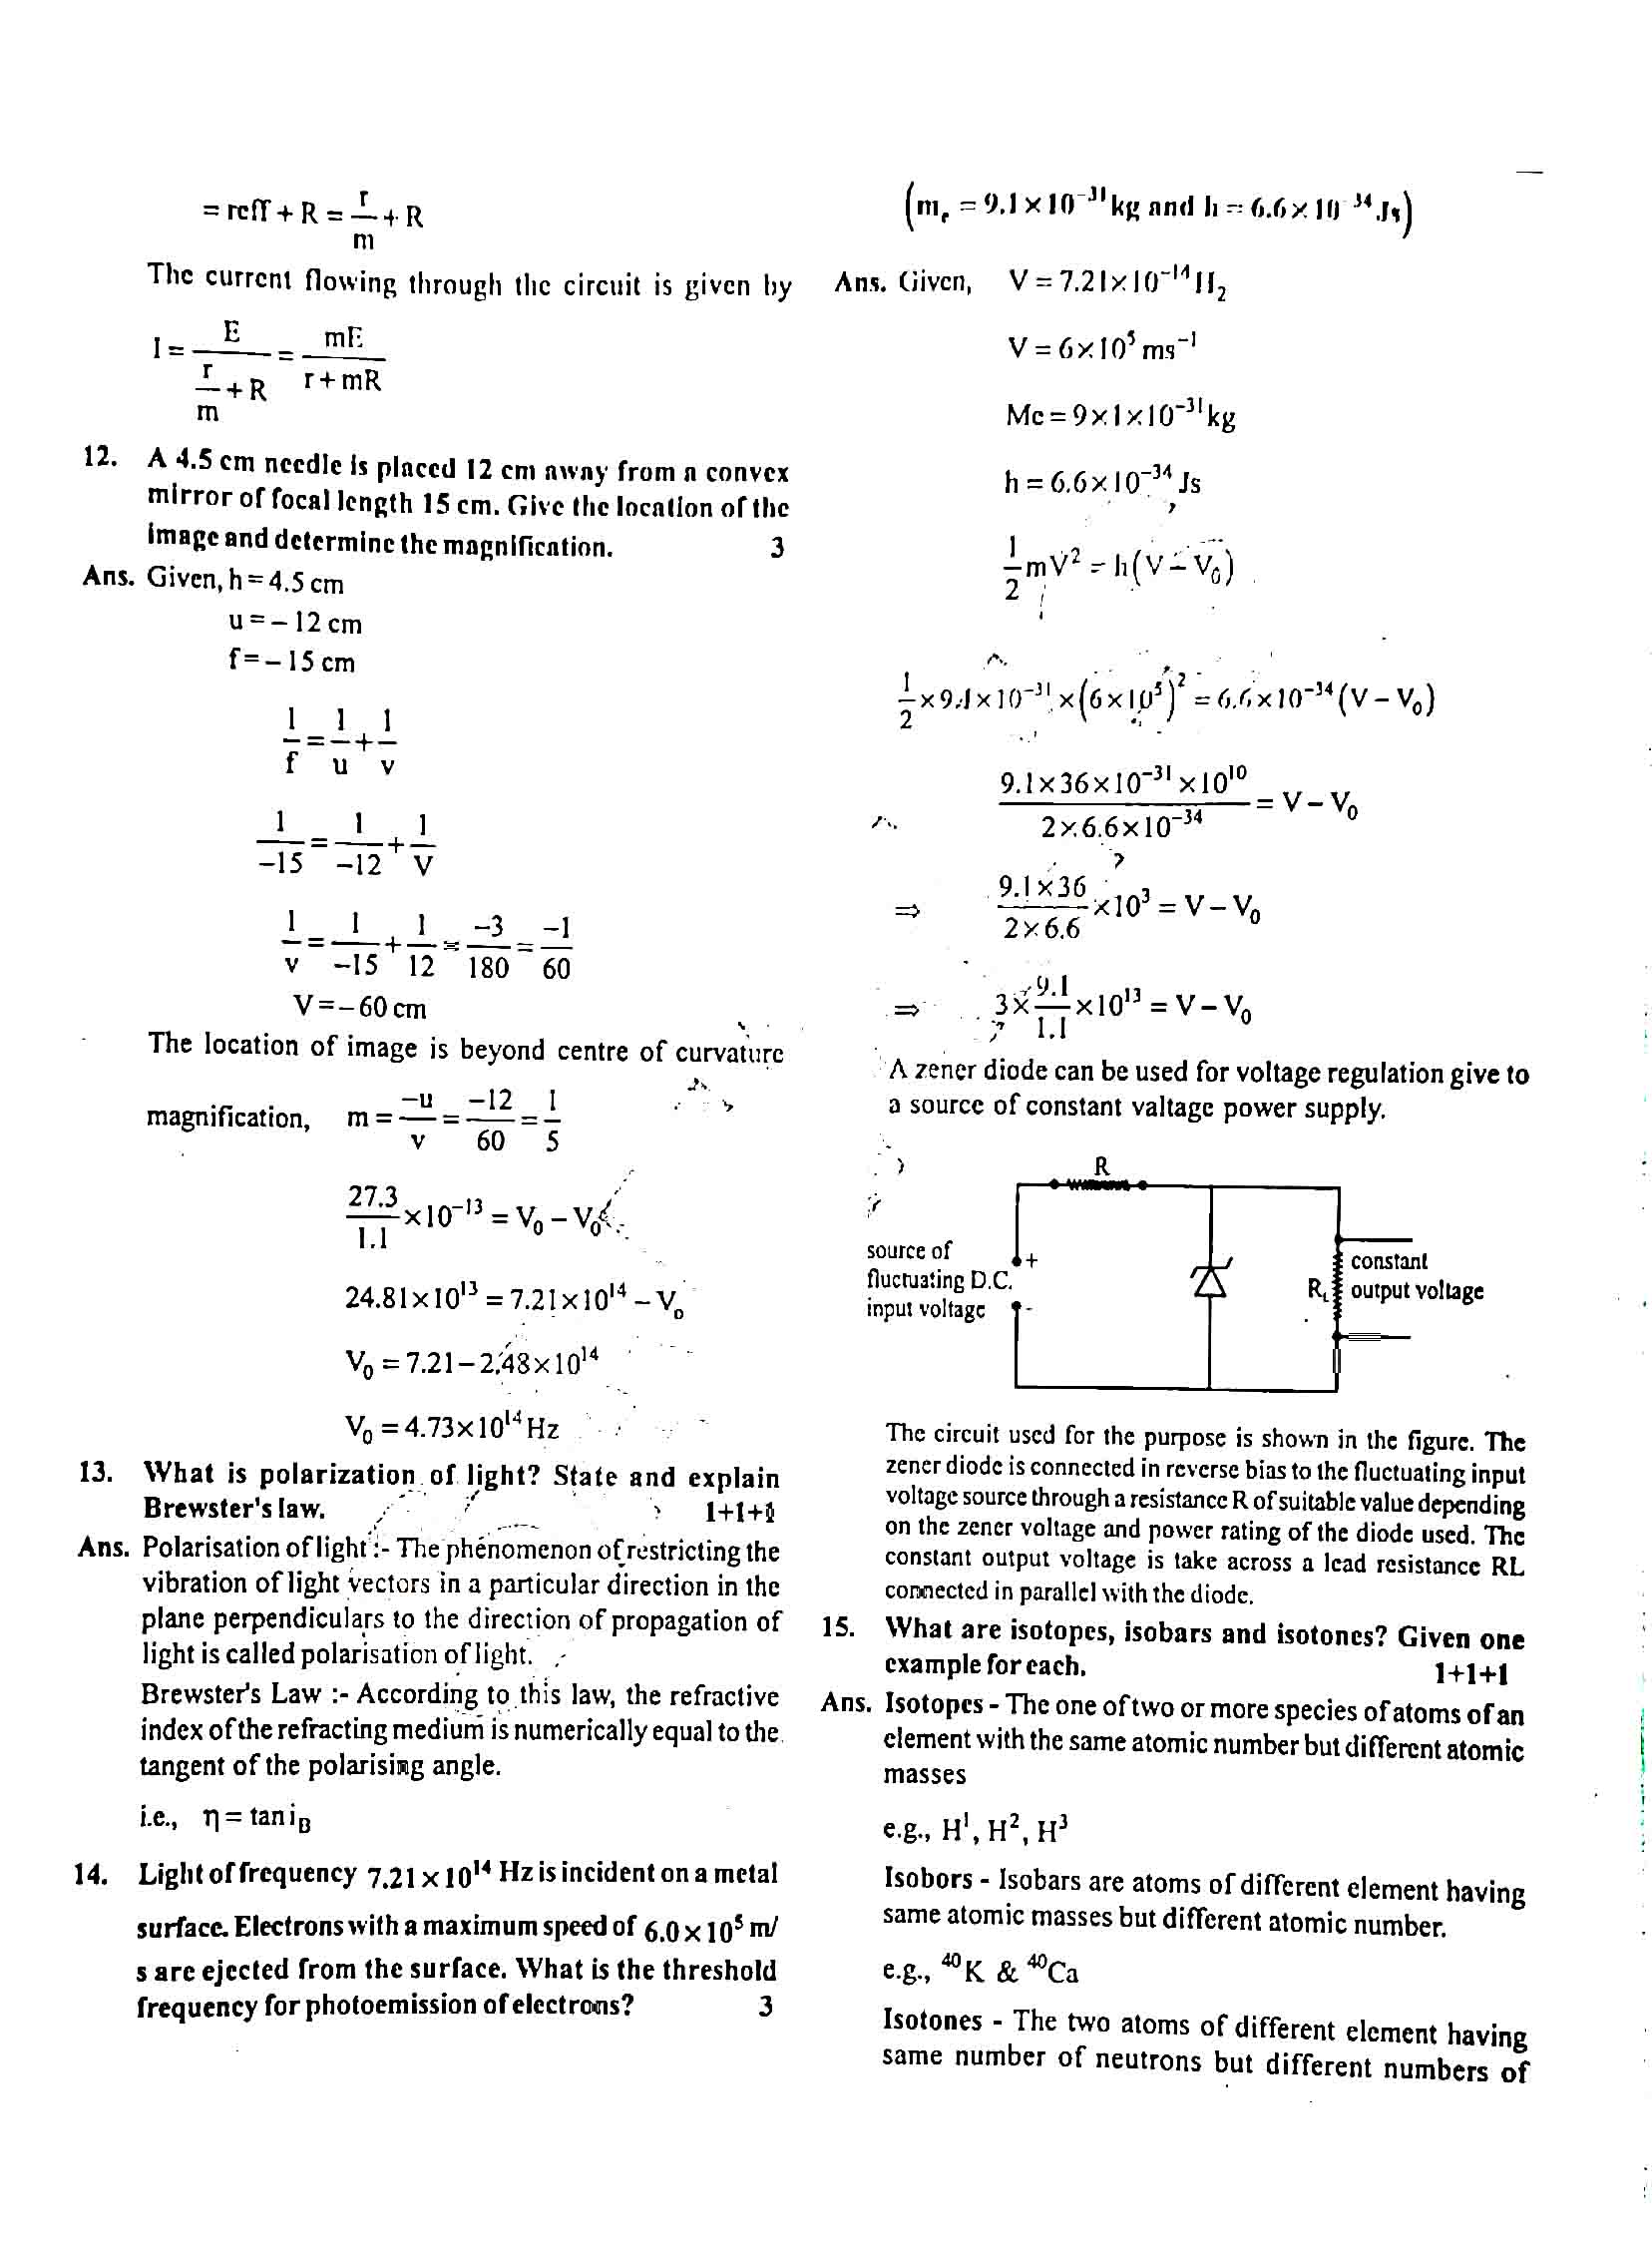 JAC Class 12 Physics 2019 Question Paper 04